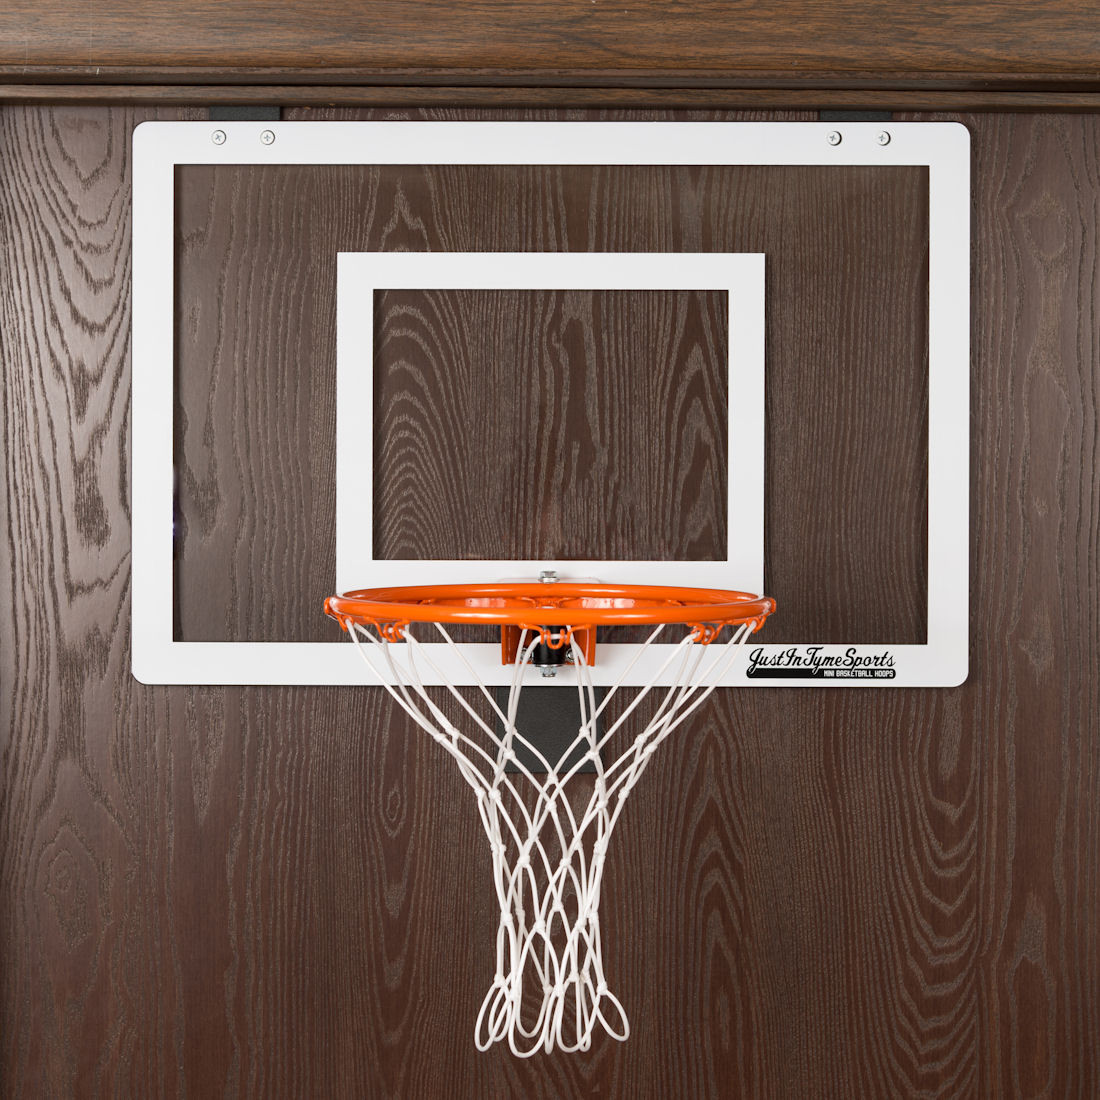 Mini Pro Elite Hoop Set & Mini Pro Elite Door Mount Basketball Hoop Set - JustInTymeSports Pezcame.Com